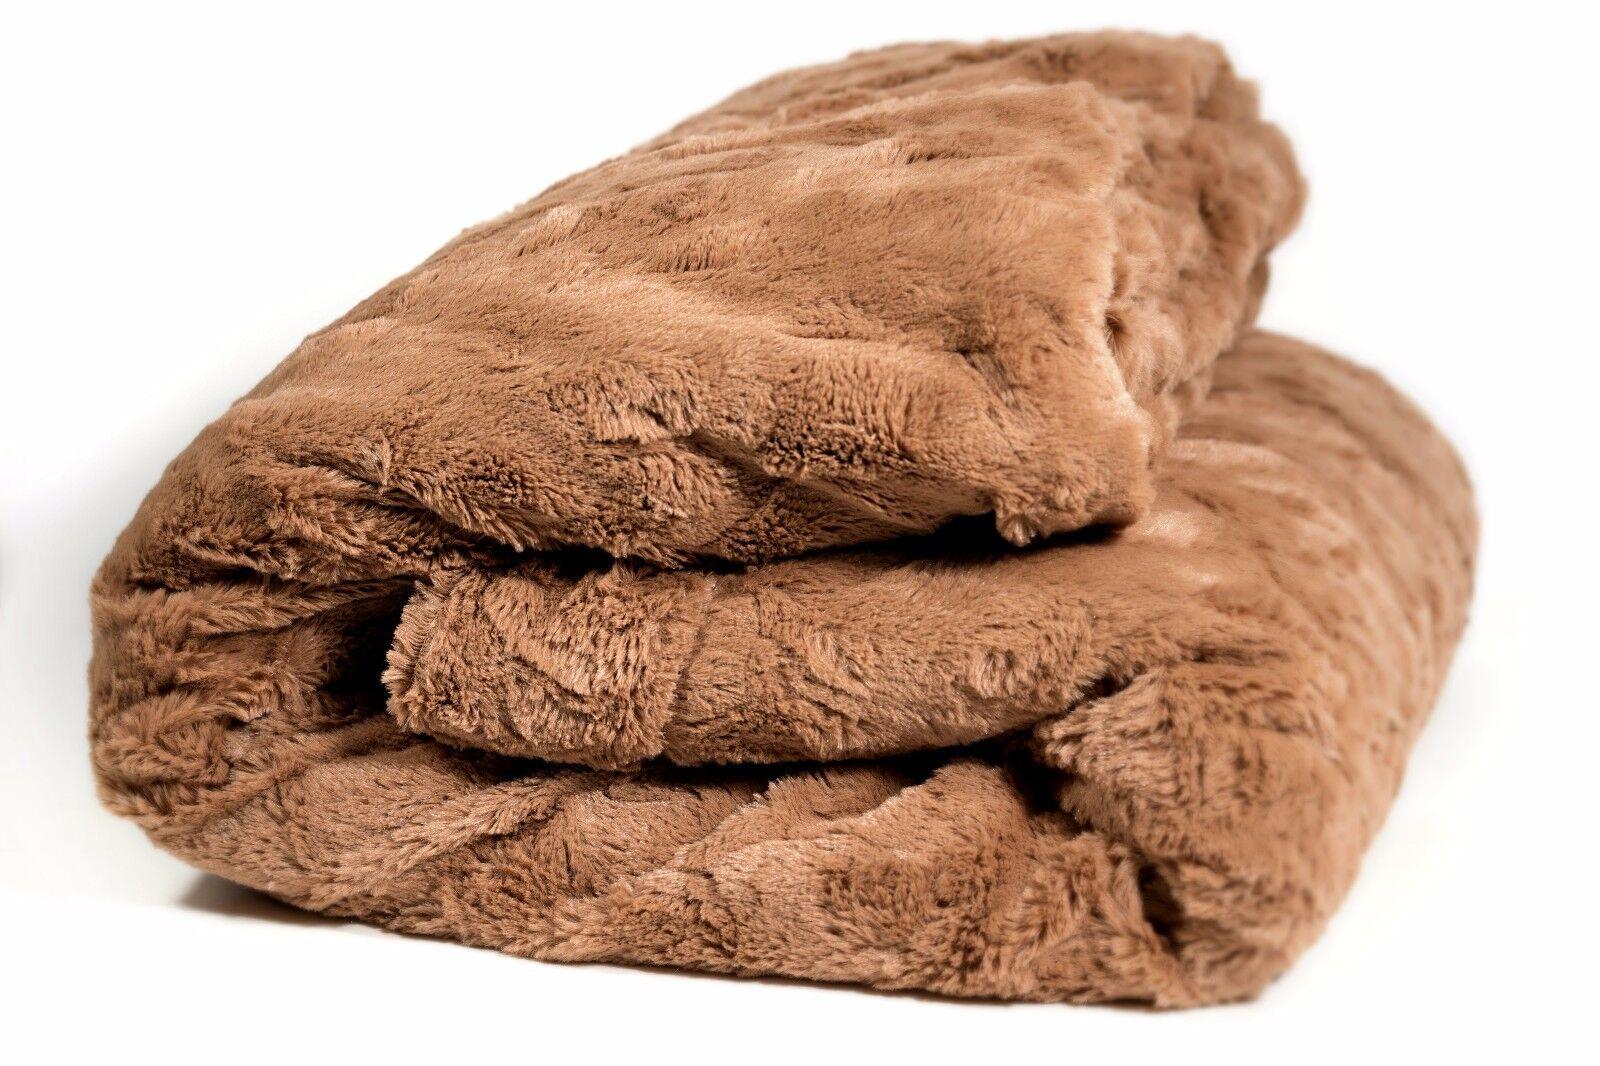 DaDa Bedding Luxury Soft Warm Mocha Brown Faux Sherpa Fleece Throw Blanket 50x60